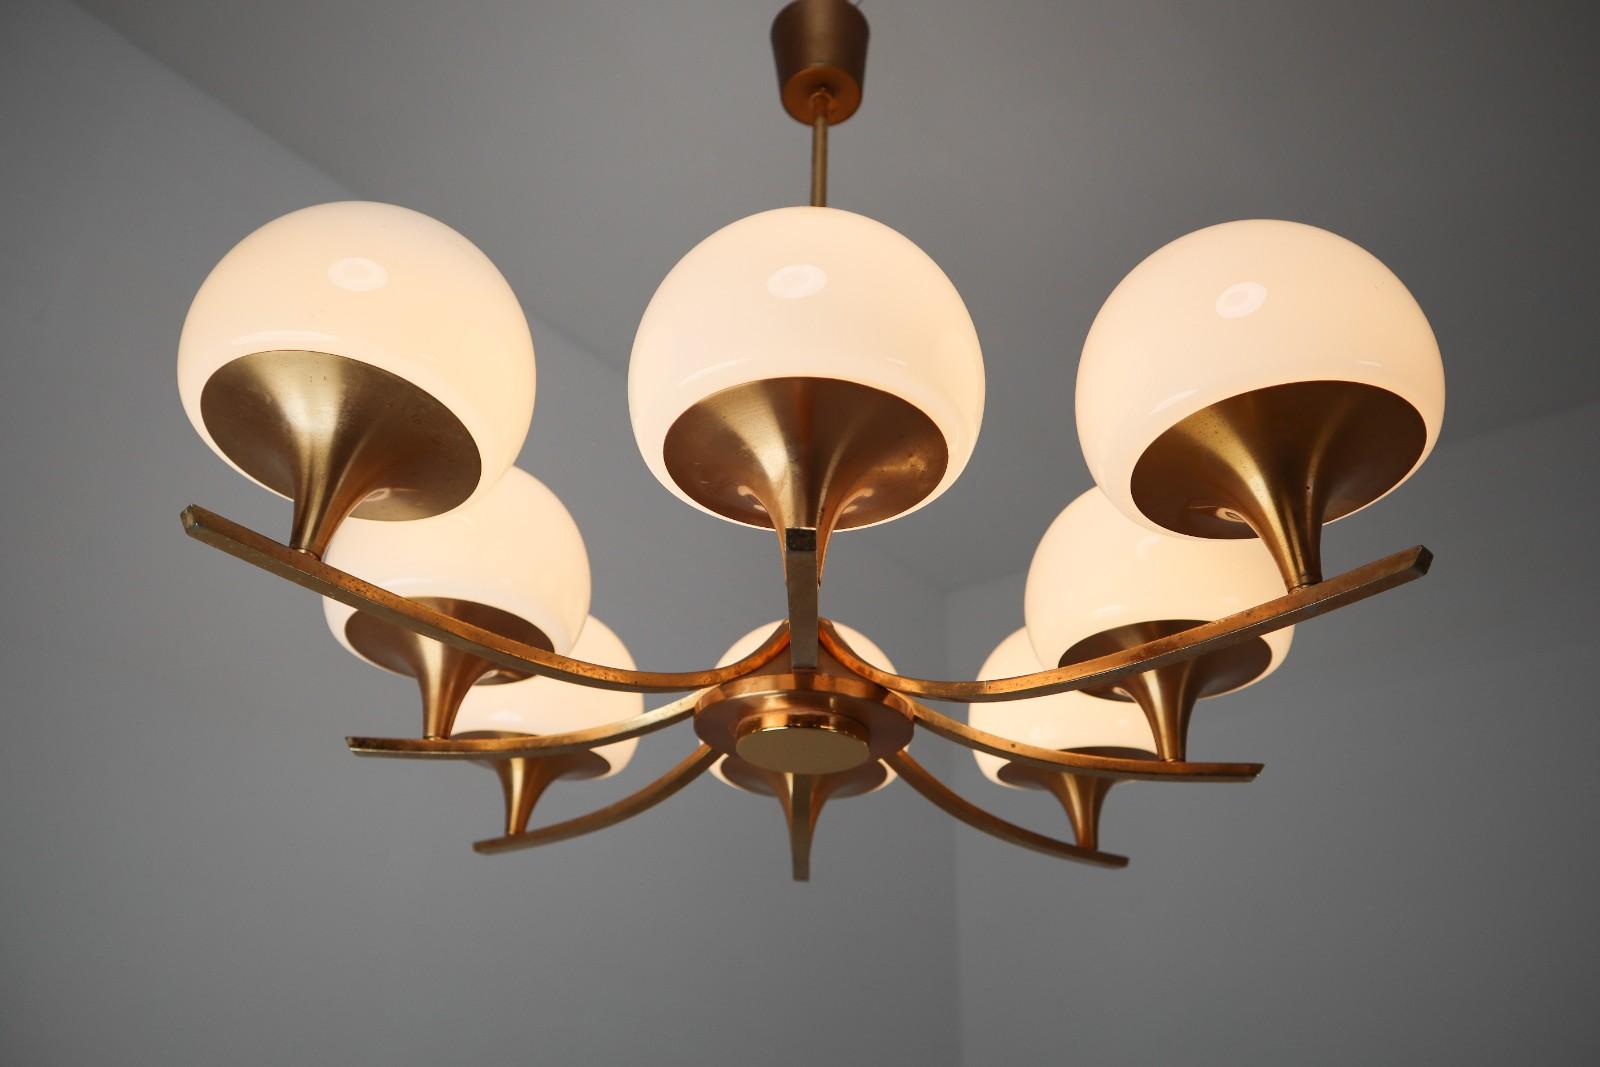 Elegant Mid Century Chandelier With 9 Opaline Glass Patinated Brass Frame Davidowski Recent Added Items European Antiques Decorative